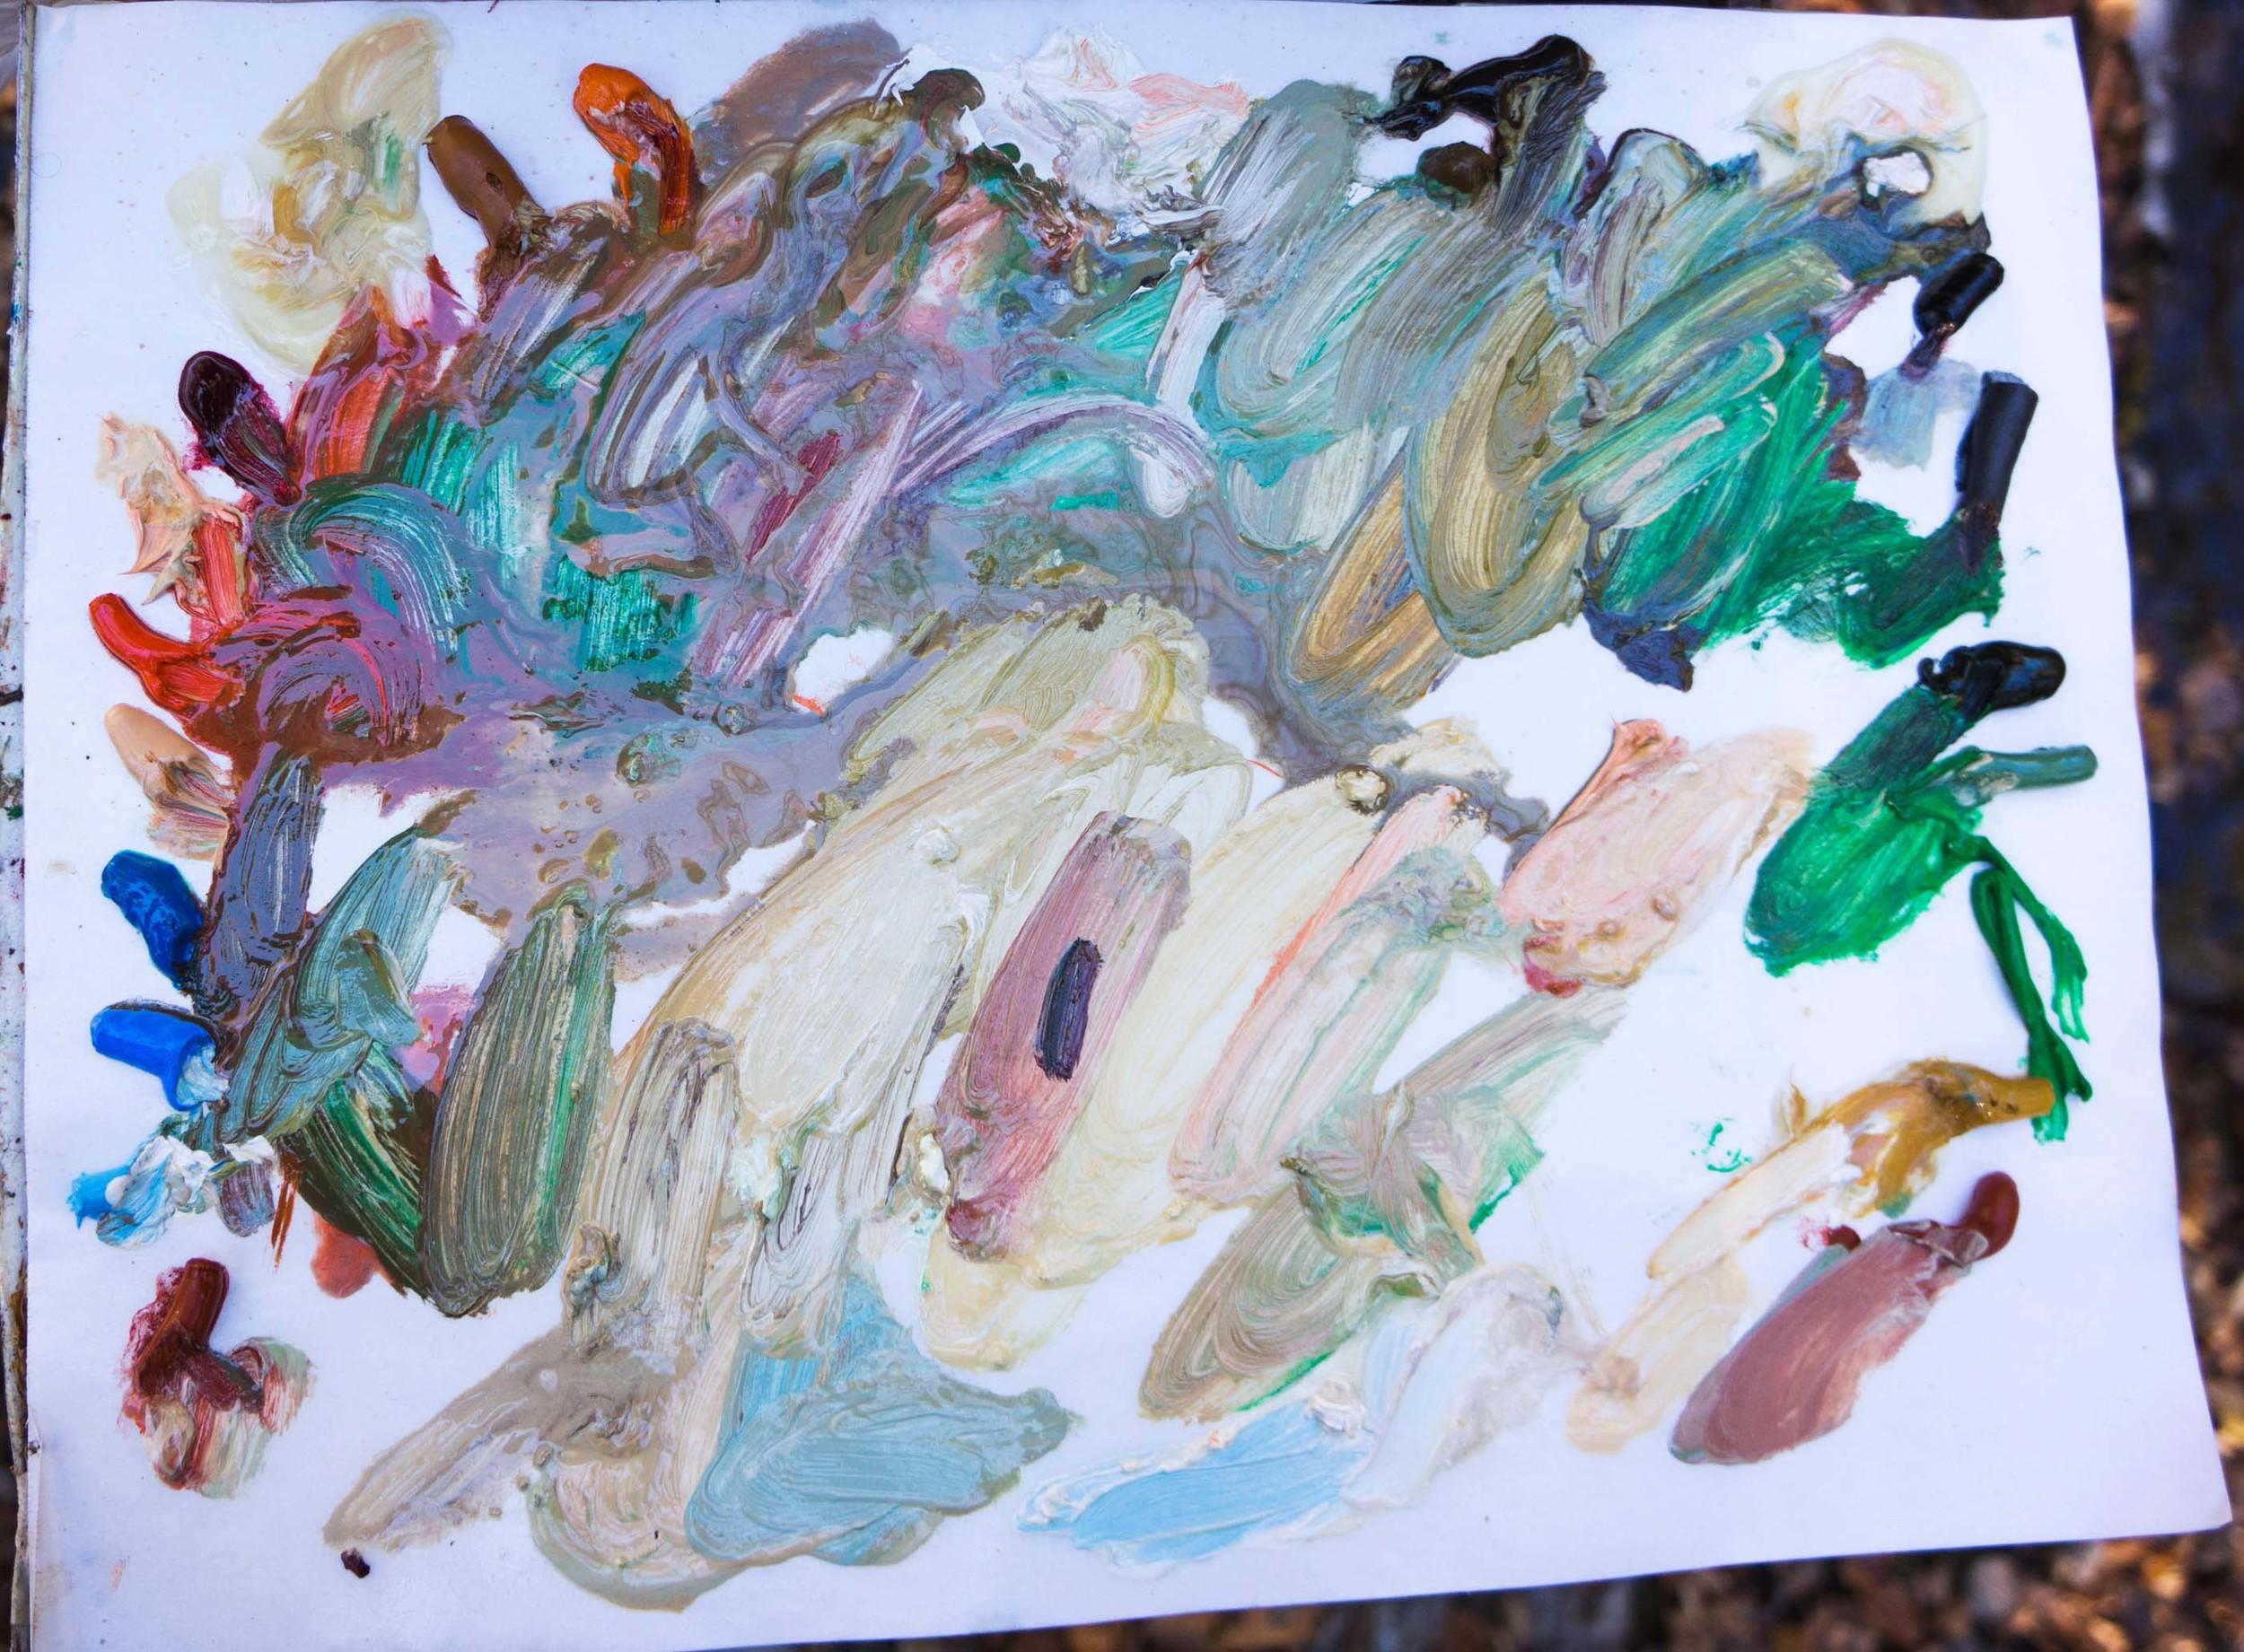 site-11-11-13 LR RAW n. crestone creek-palette.jpg